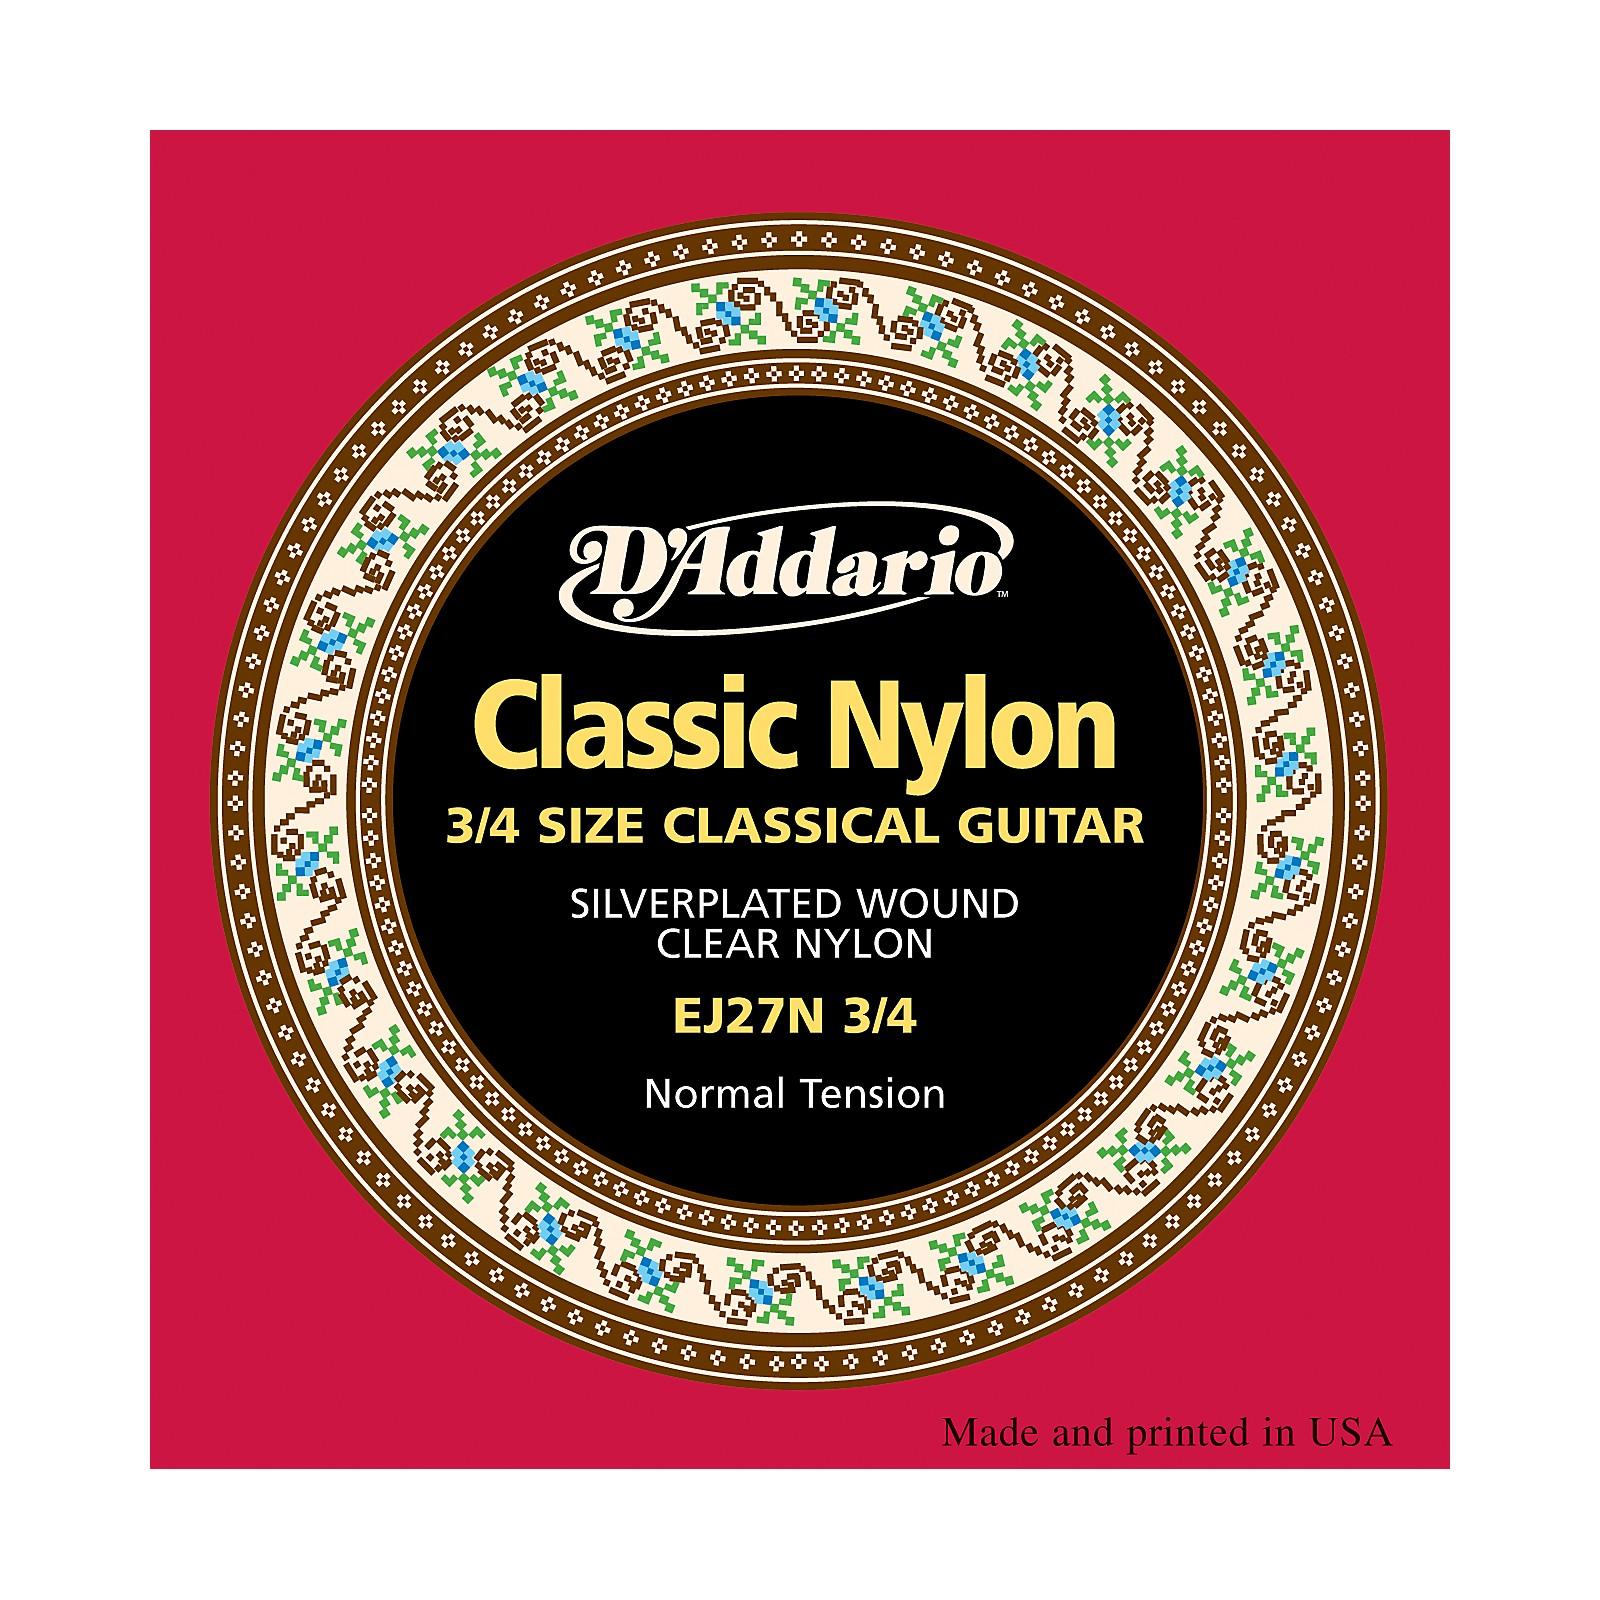 D'Addario EJ27 Nylon Classical Guitar Strings - 3/4 Size